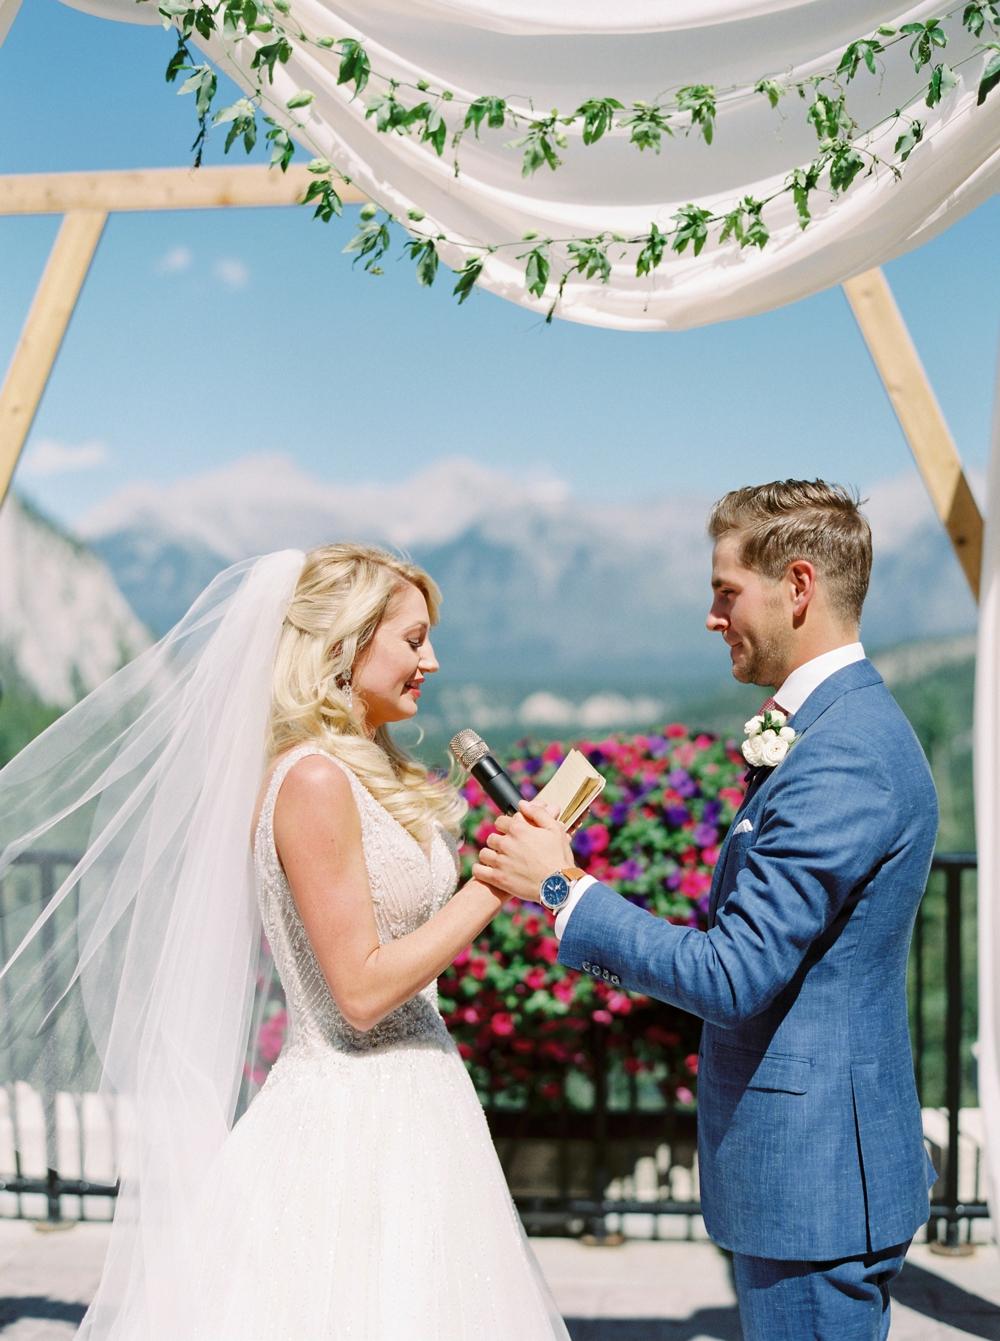 Wedding ceremony floral arch way decor at the Fairmont Banff Springs Hotel | Banff Rocky Mountain Wedding Photographers | Justine Milton fine art film photography